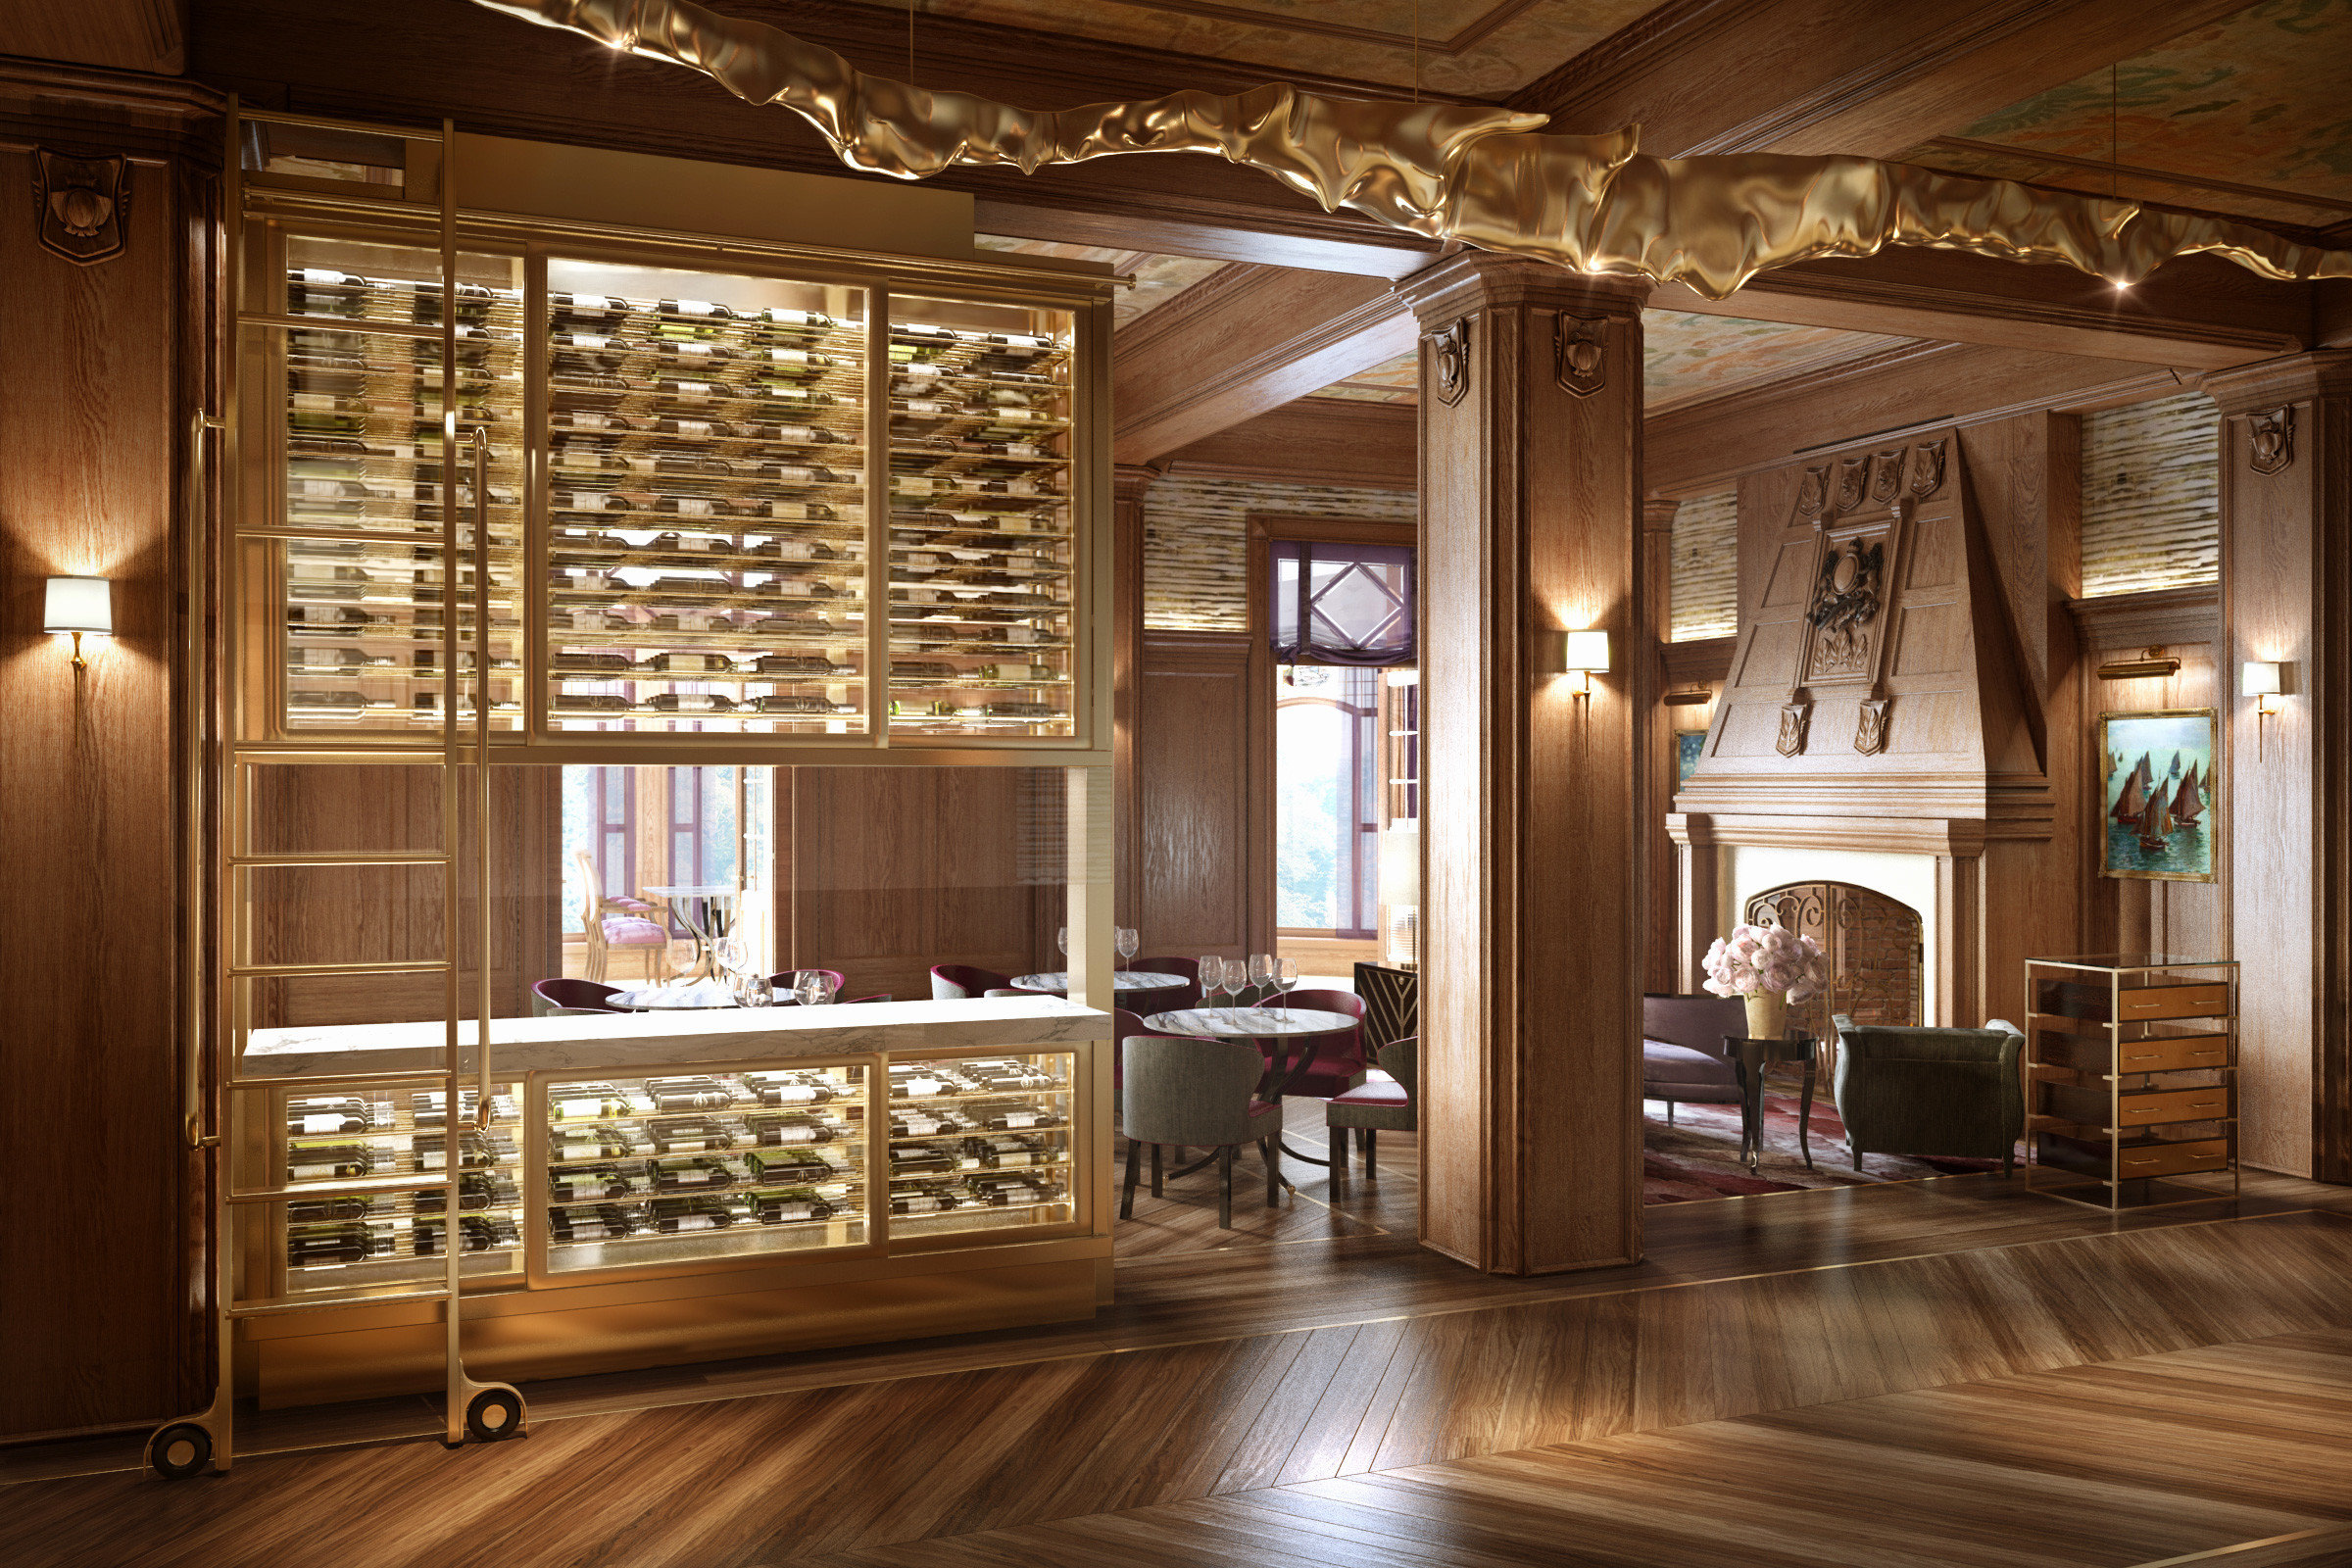 Dining Drink Eat Resort cabinetry hardwood living room home wooden lighting wood flooring Lobby mansion hard